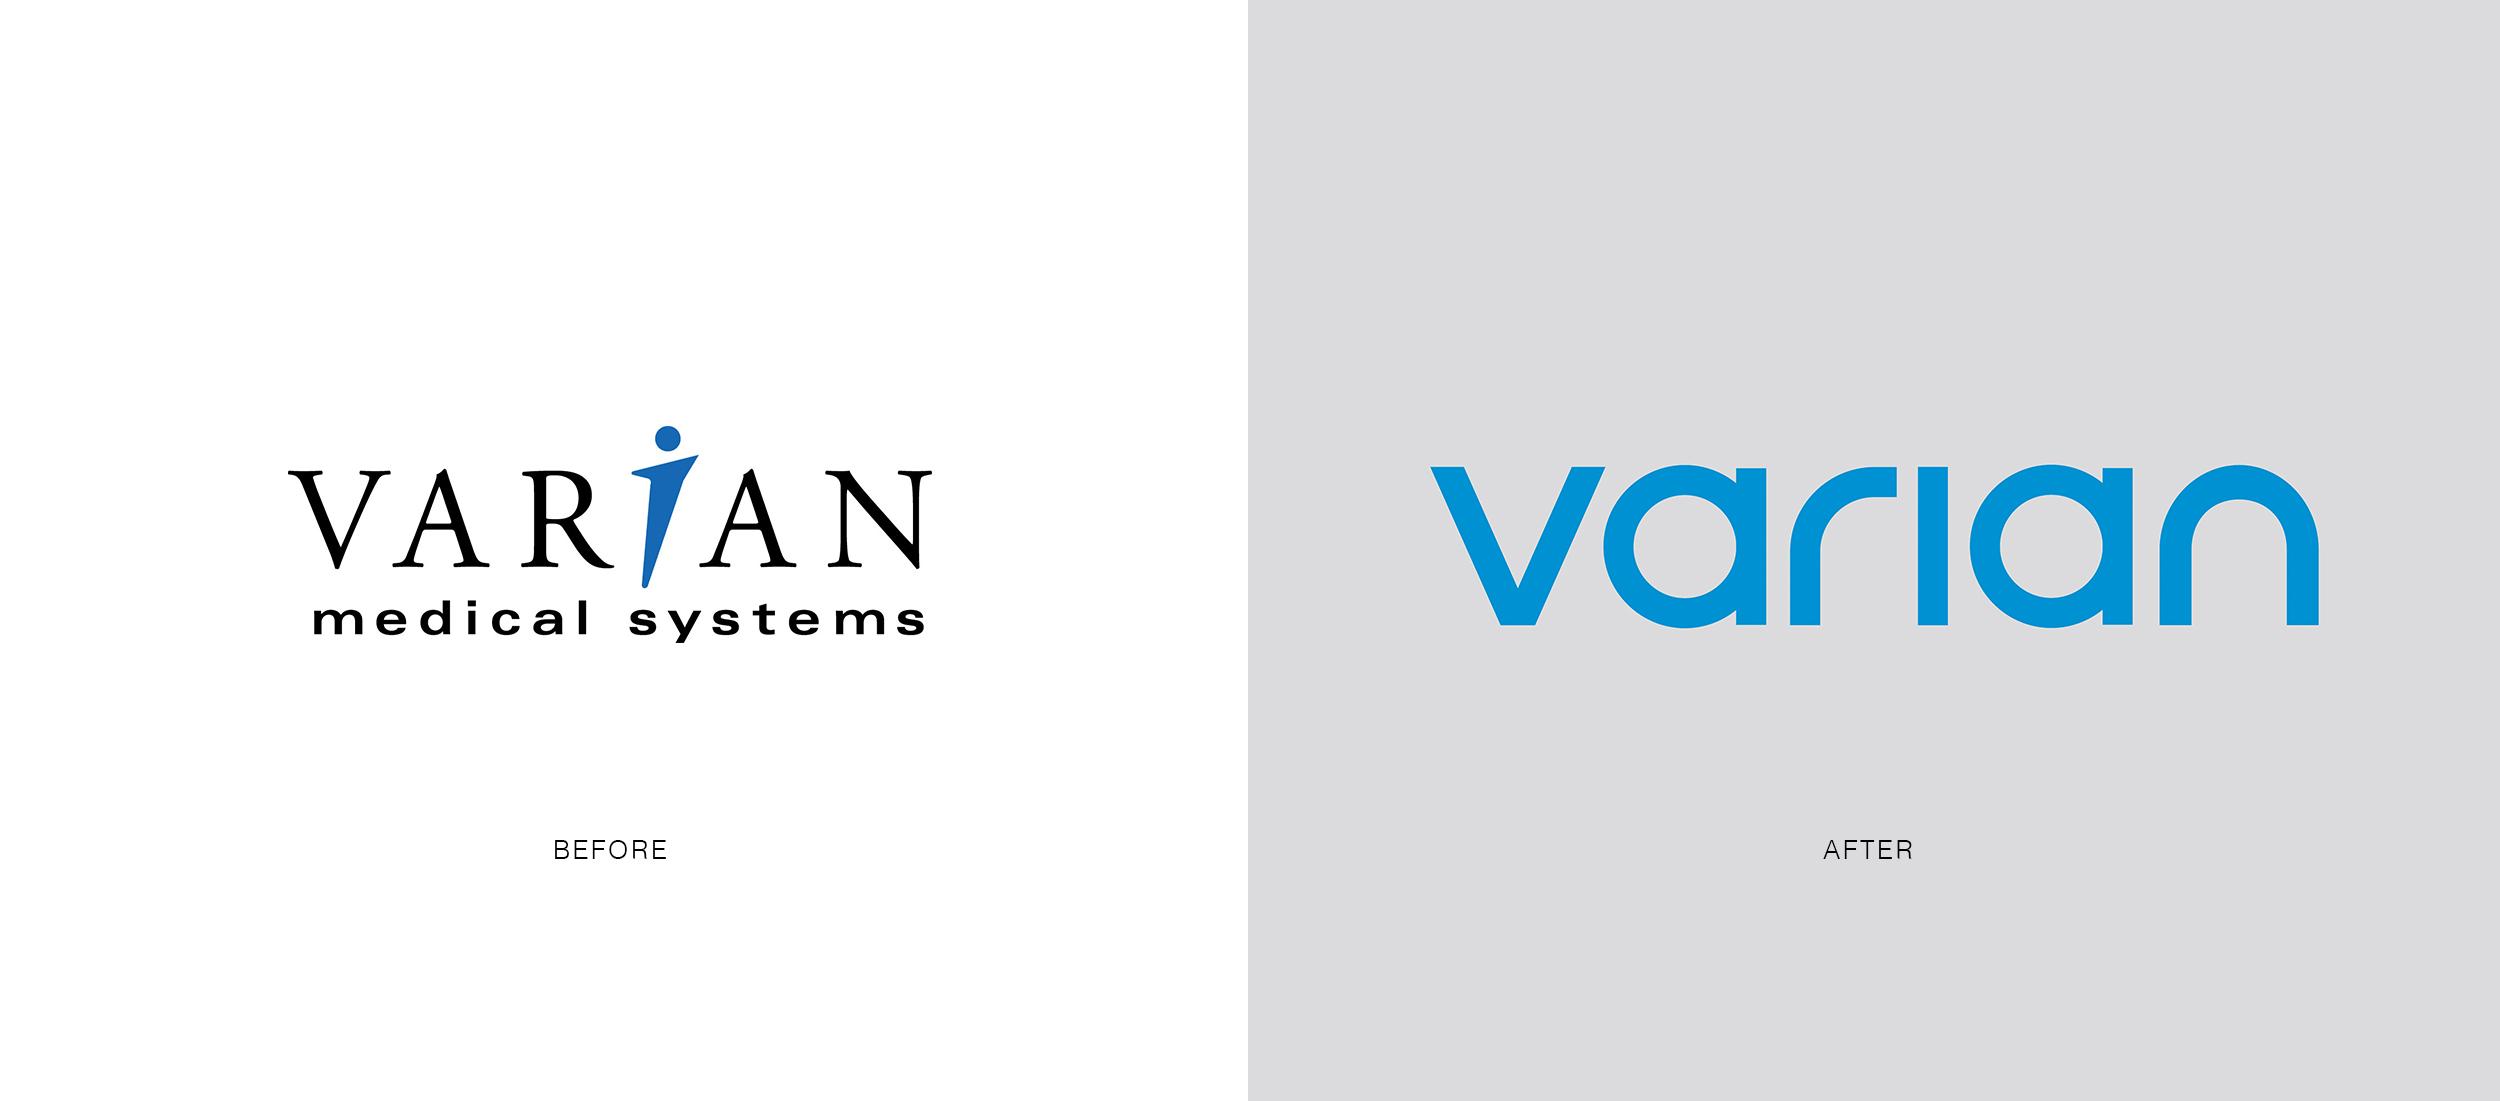 Varian_comparison.jpg